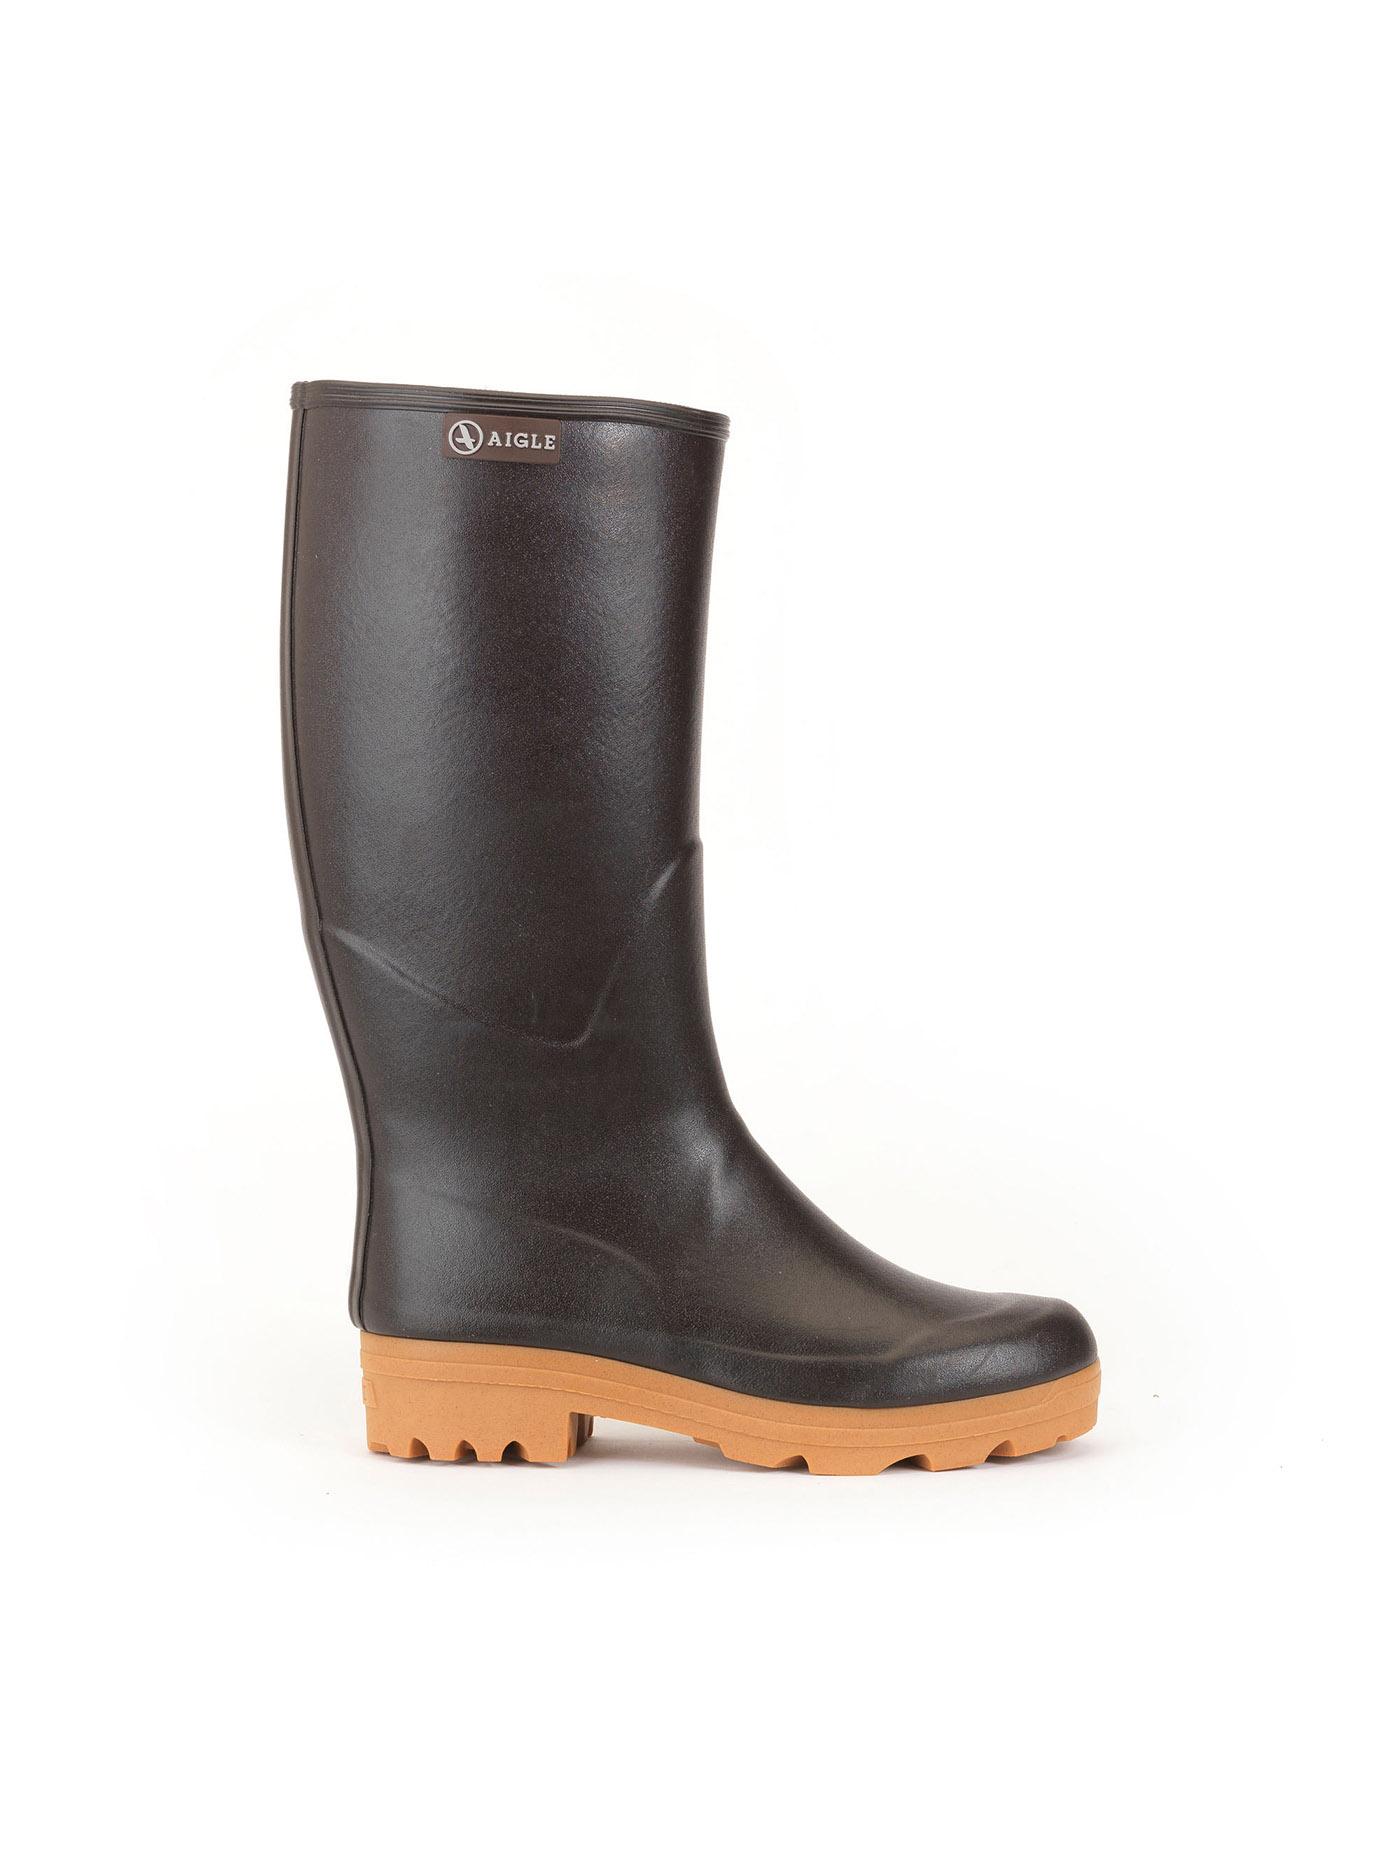 CHAMBORD PRO | Men's warm boots Brun | Aiglemen | AIGLE